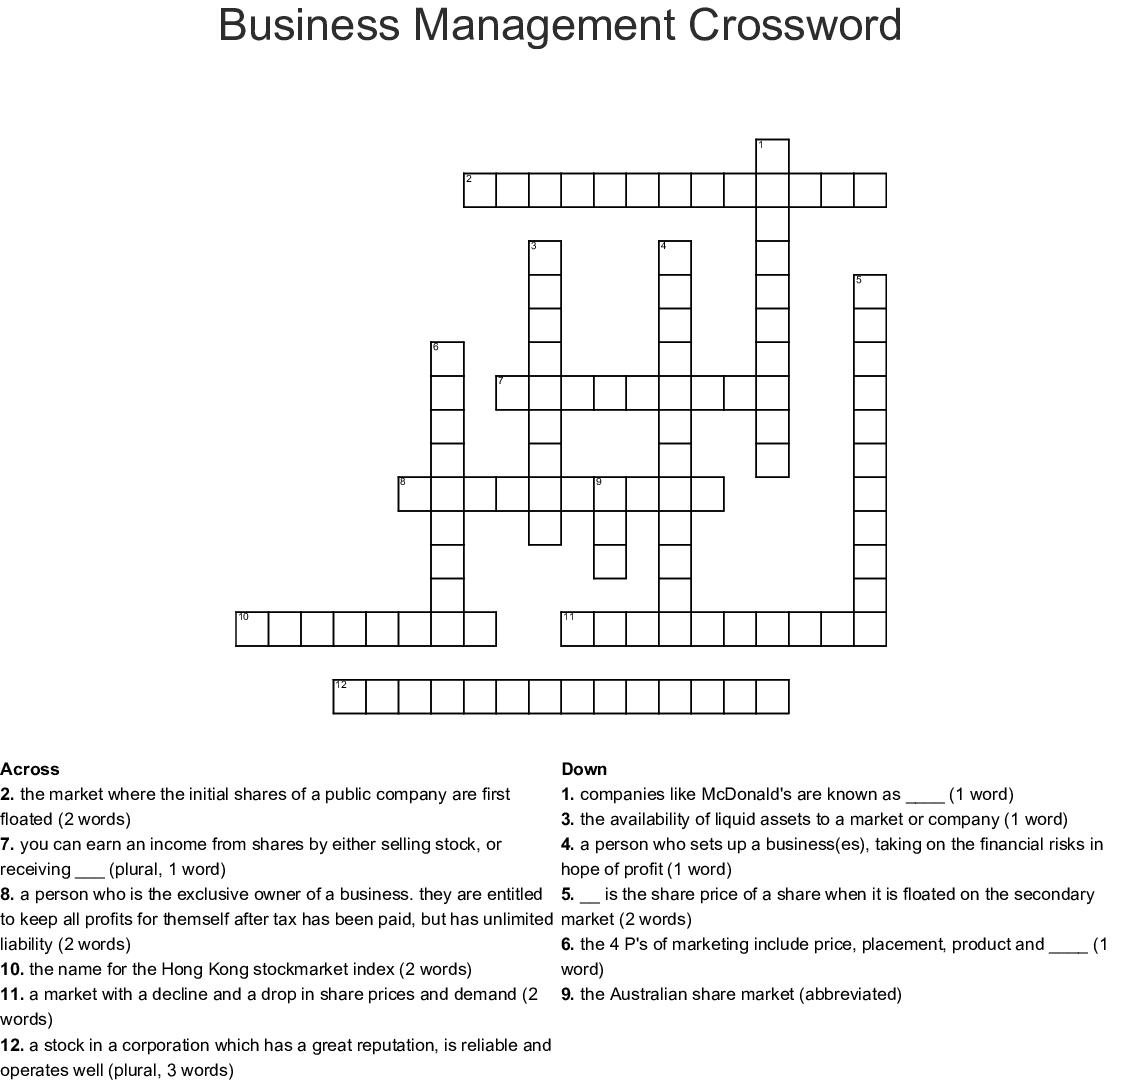 Business Management Crossword Wordmint